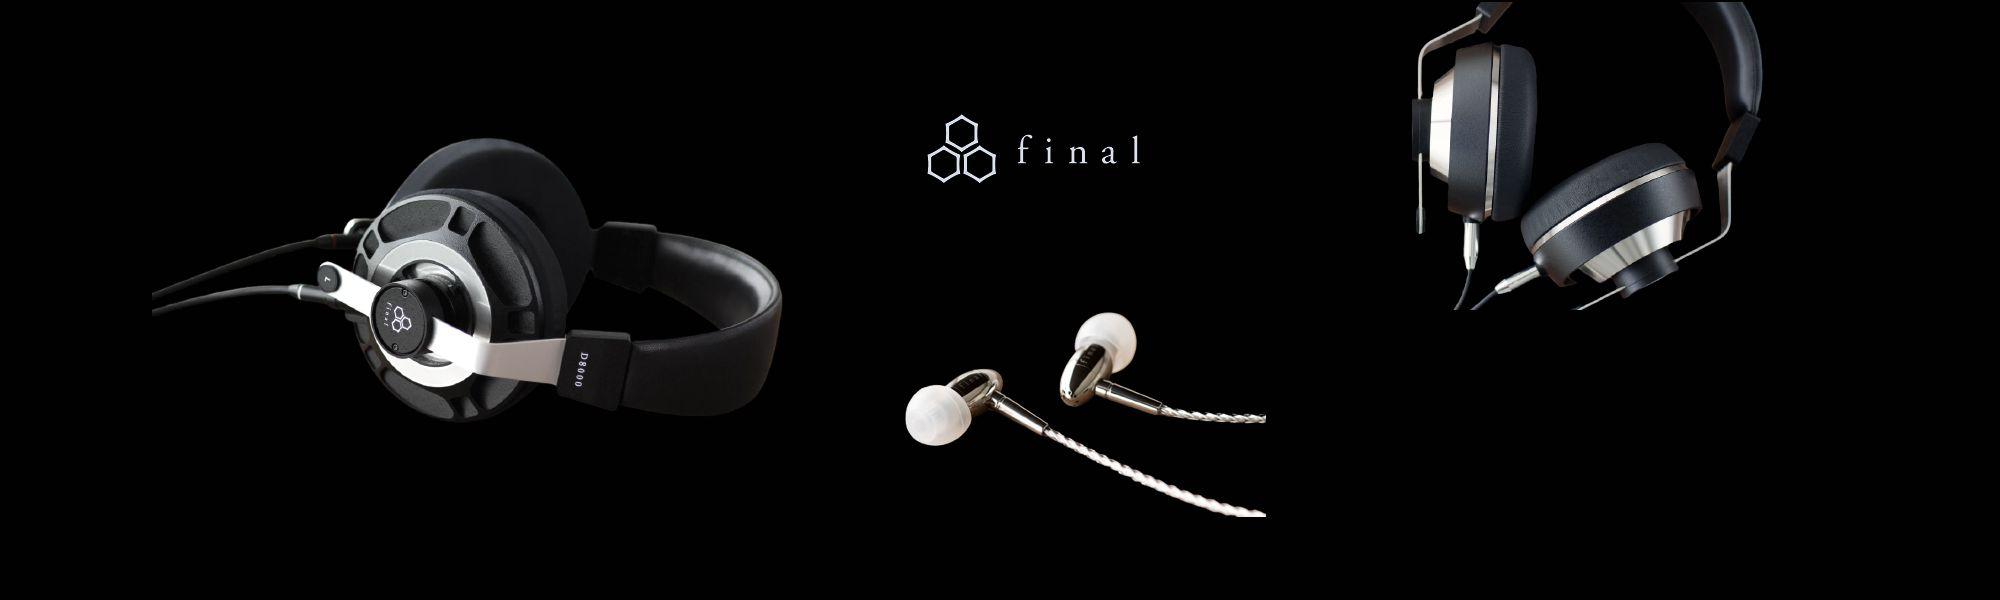 Final Kopfhörer kaufen